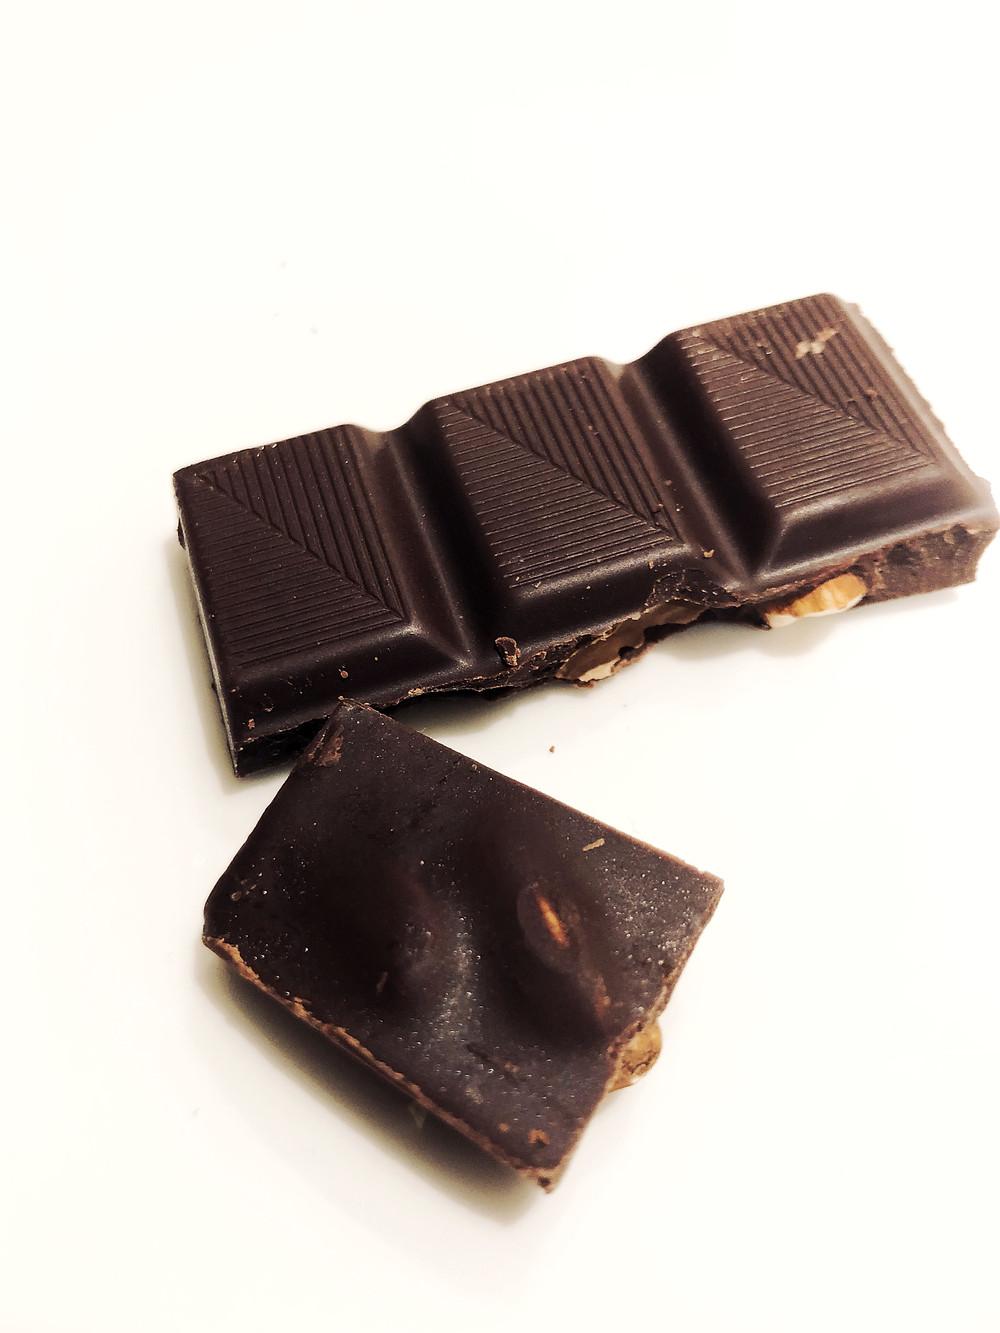 vegan chocolate, sustainable food, no food waste, zero waste food, tips to reduce food waste, veganuary, vegan options, vegan substitutes